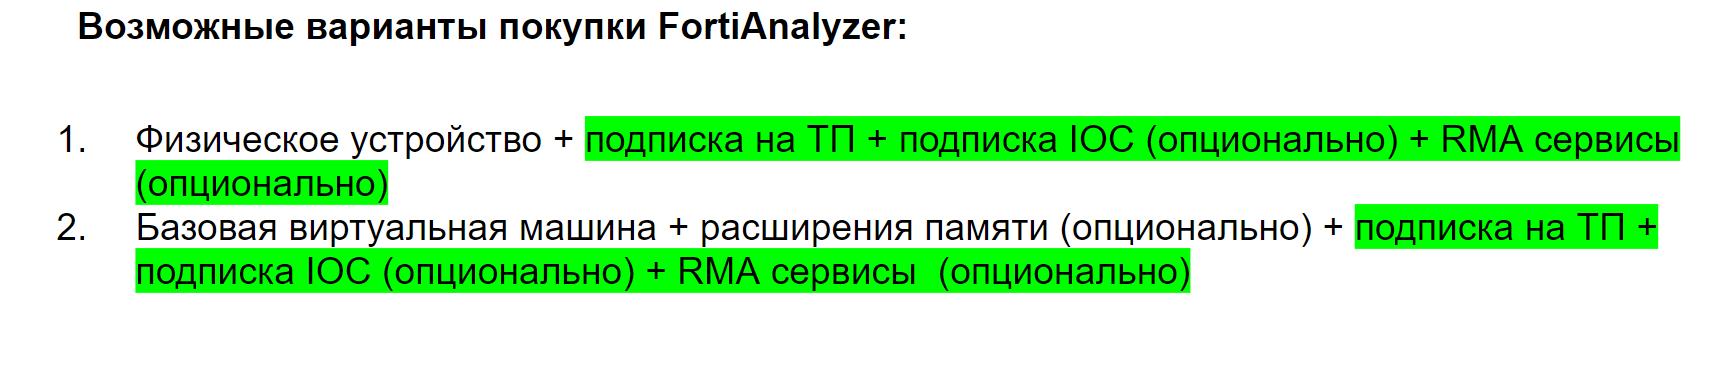 11. Fortinet Getting Started v6.0. Лицензирование - 5